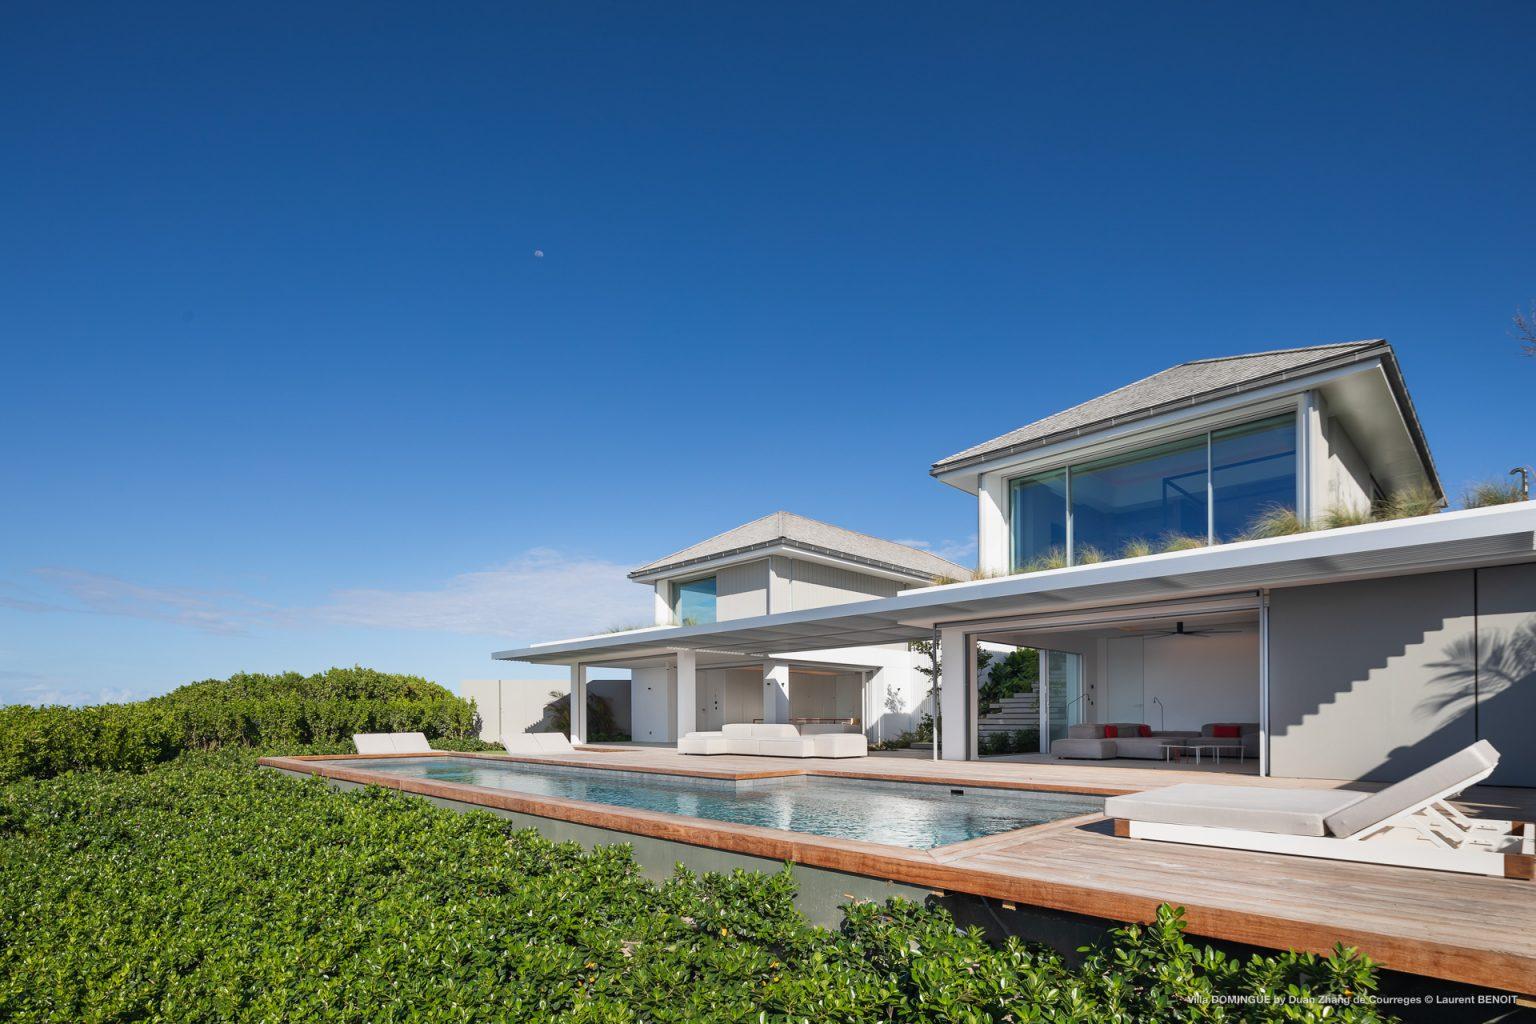 Villa Domingue - Modern Villa Rental St Barth Seaview - Outside view